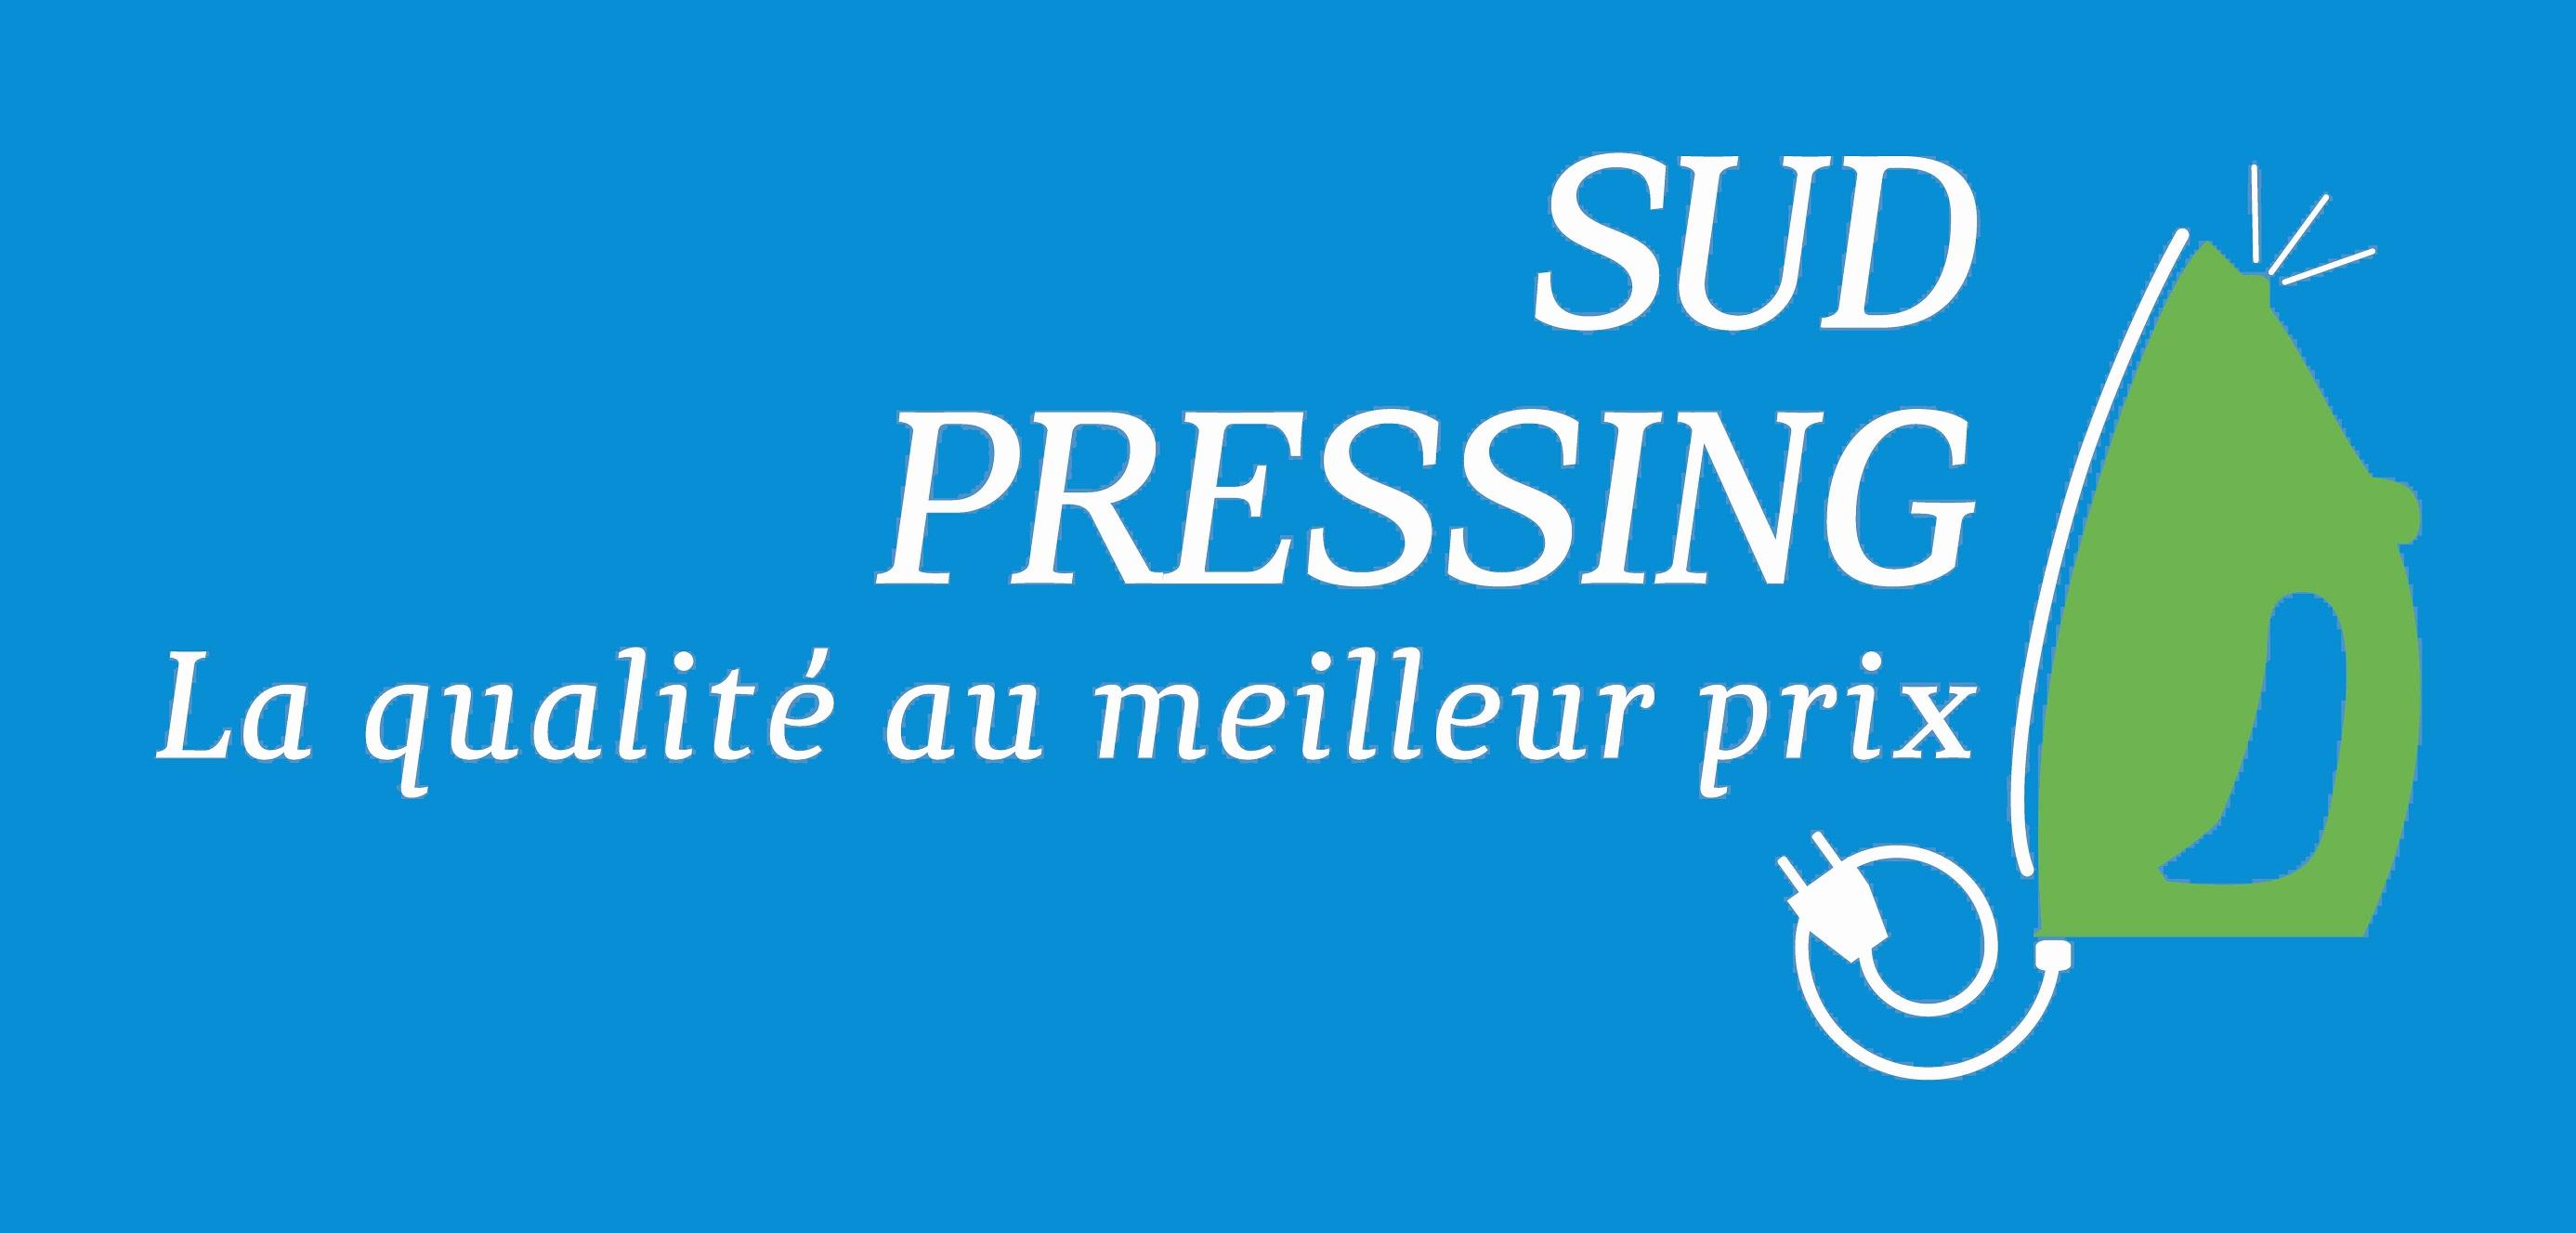 SUD PRESSING